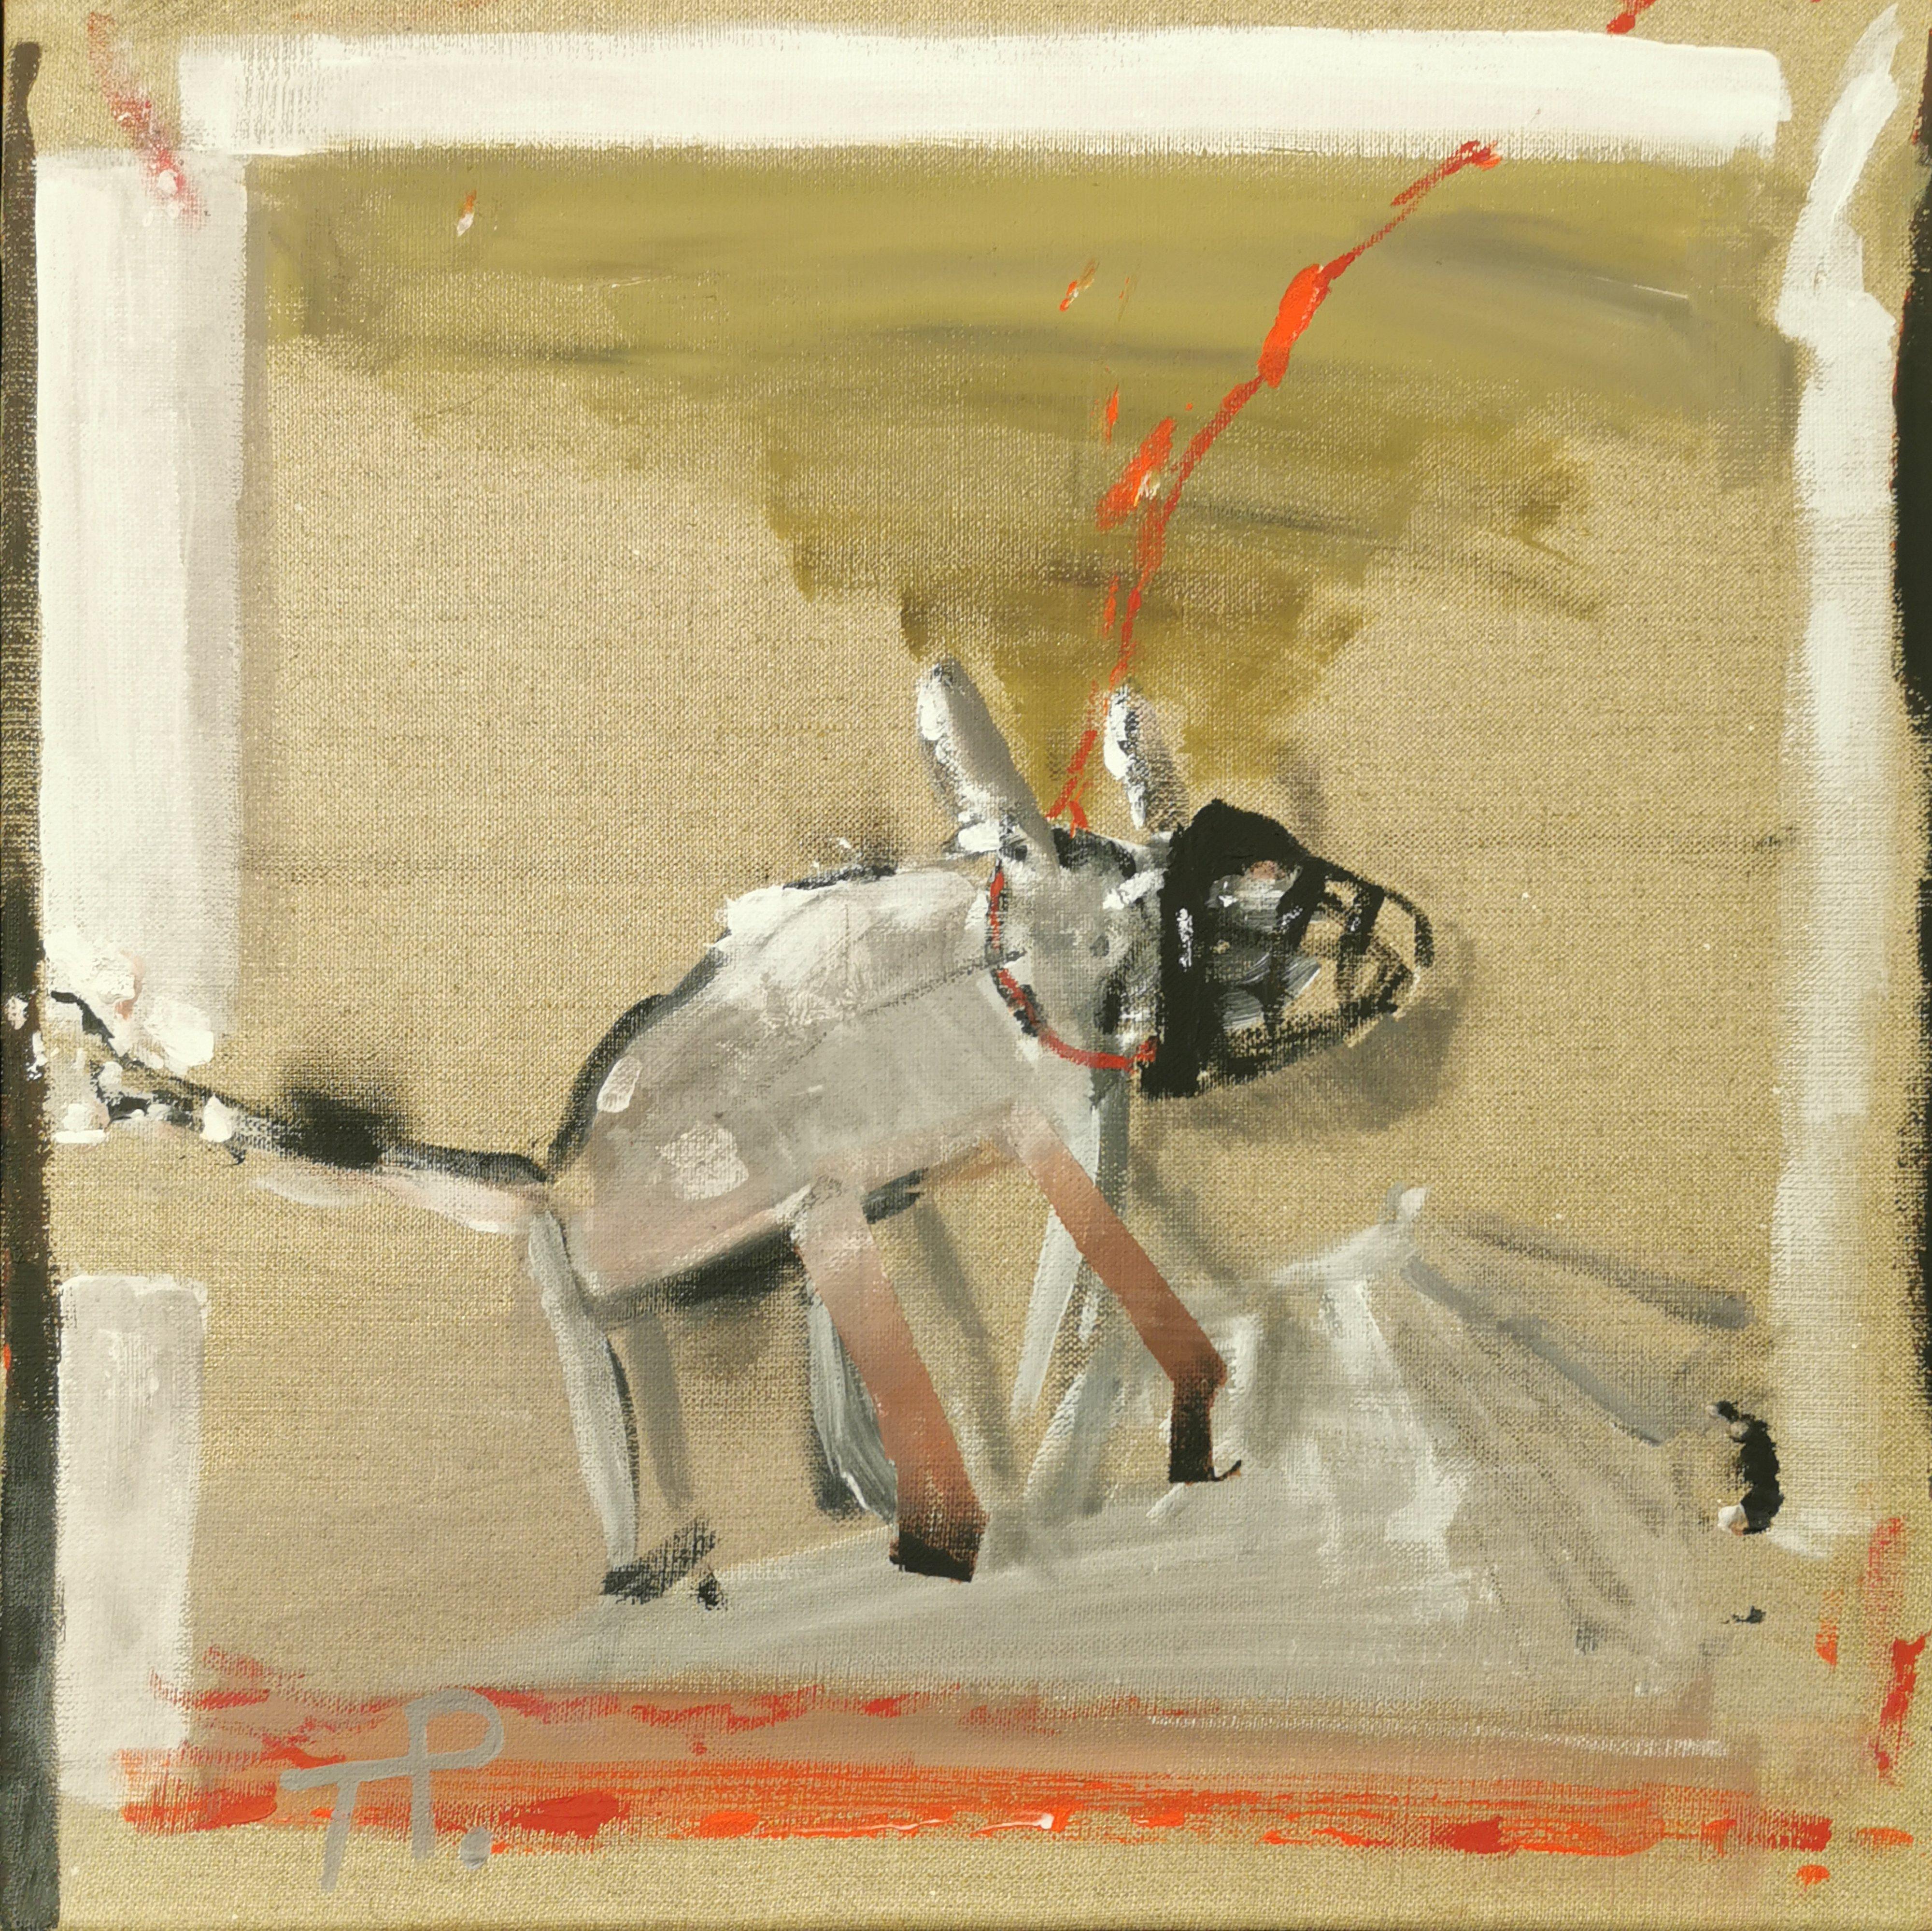 Pies na sznurku, 1996